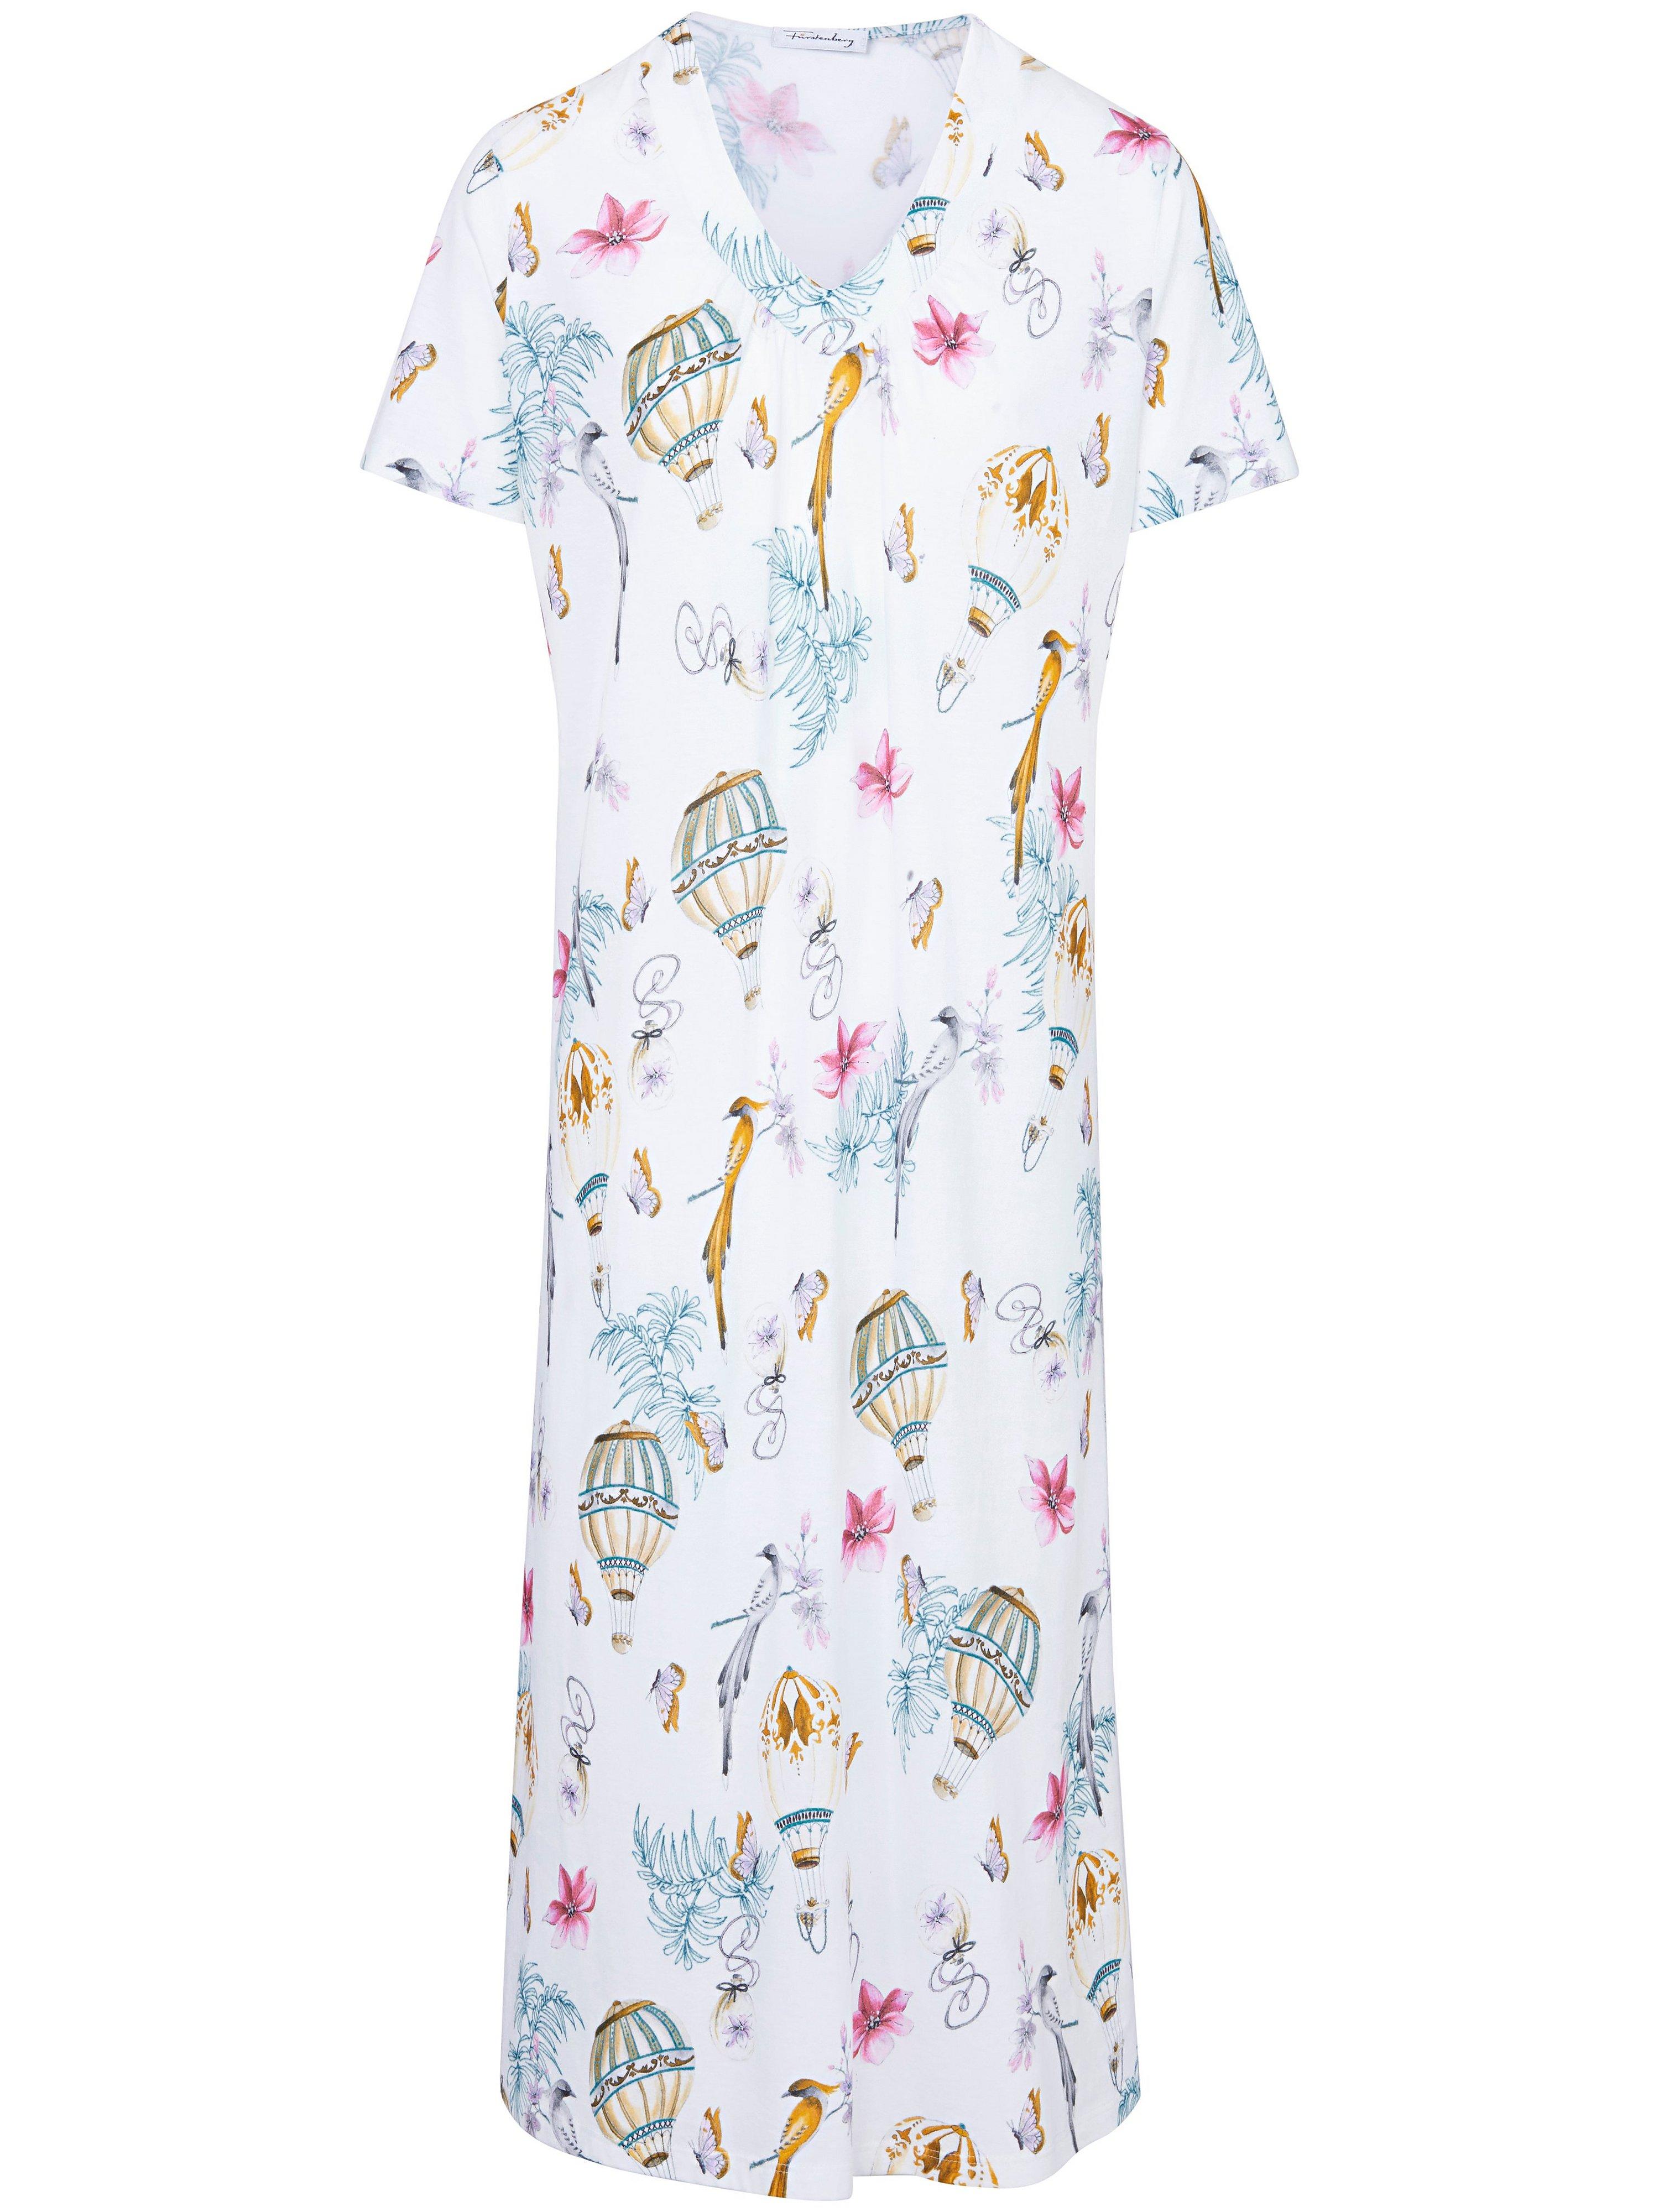 La chemise nuit 100% coton  Fürstenberg multicolore taille 42